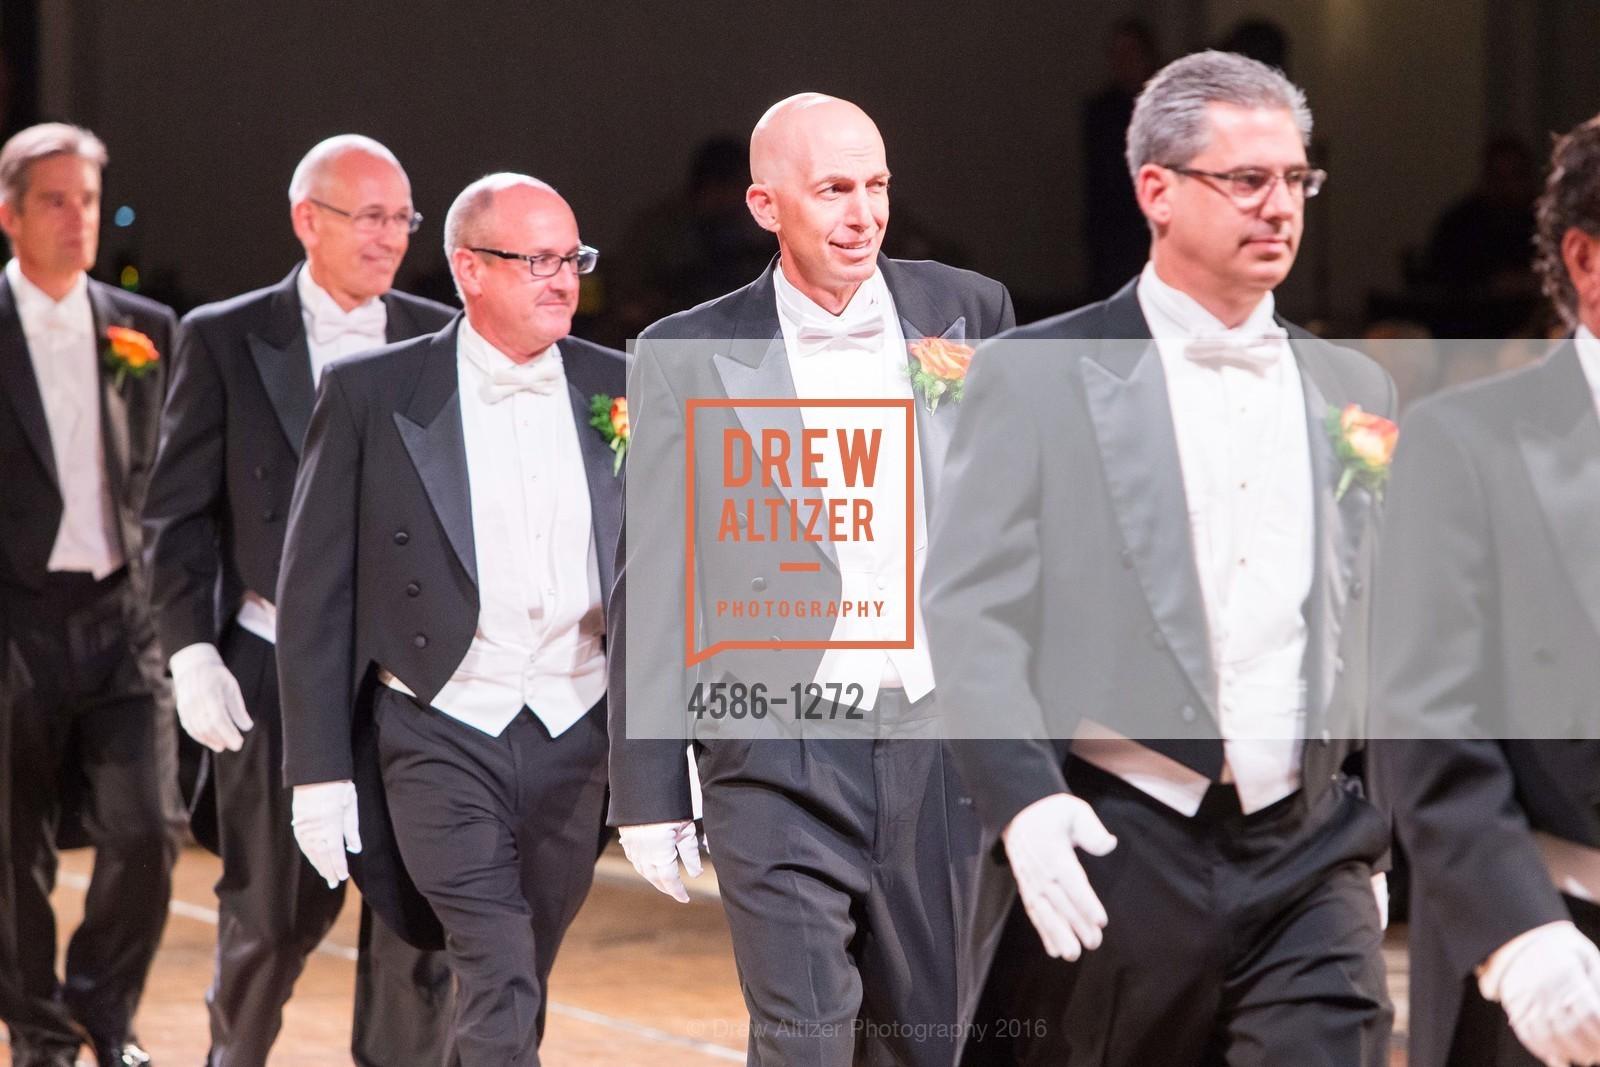 David Holscher, Neil Hadfield, Kevin Kuhn, Photo #4586-1272